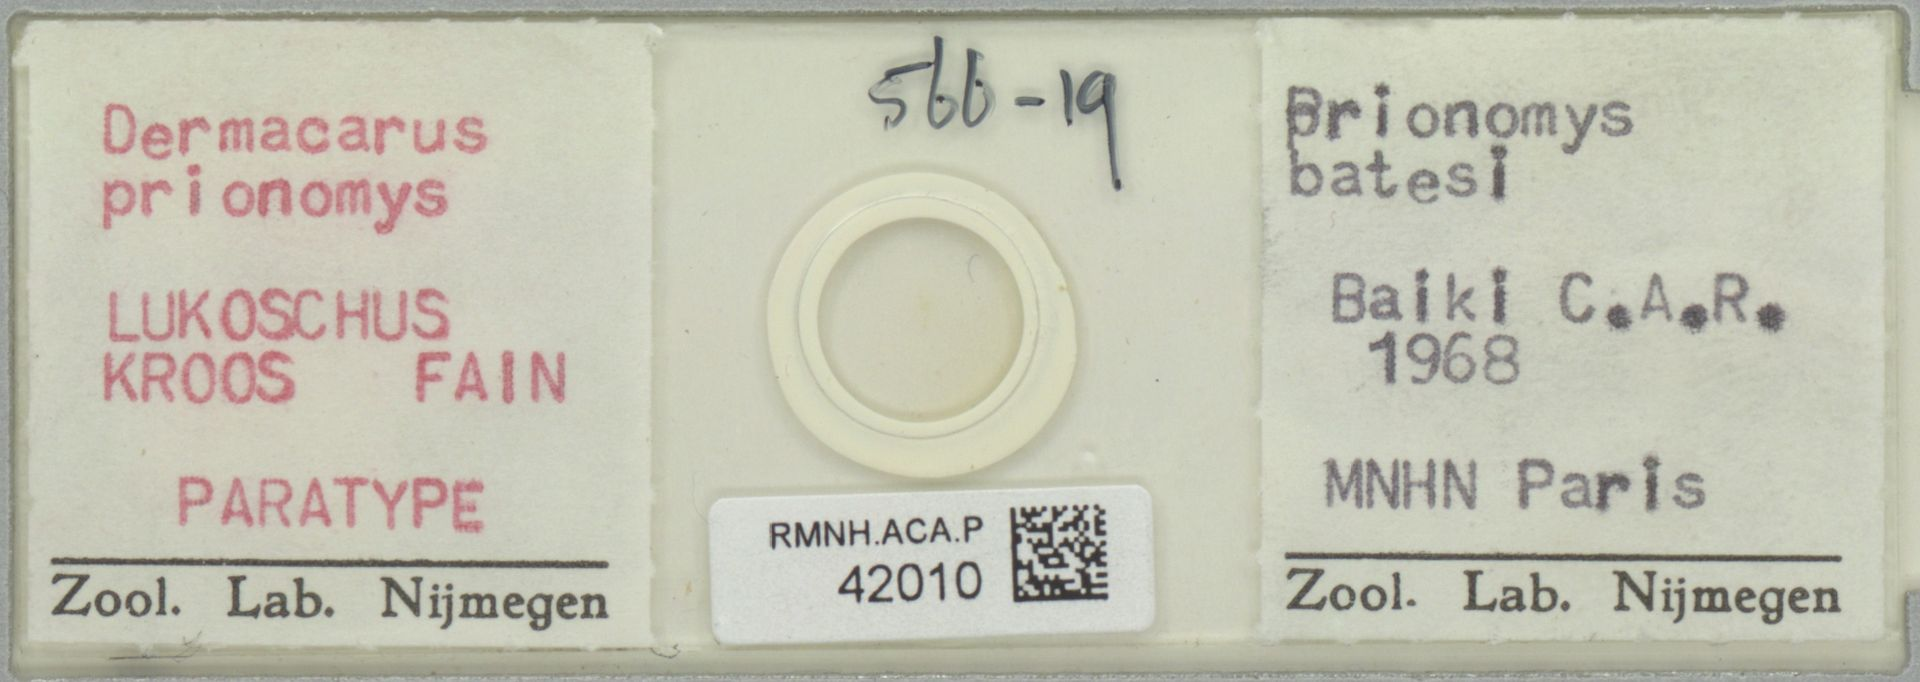 RMNH.ACA.P.42010 | Dermacarus prionomys Lukoschus Kroos Fain